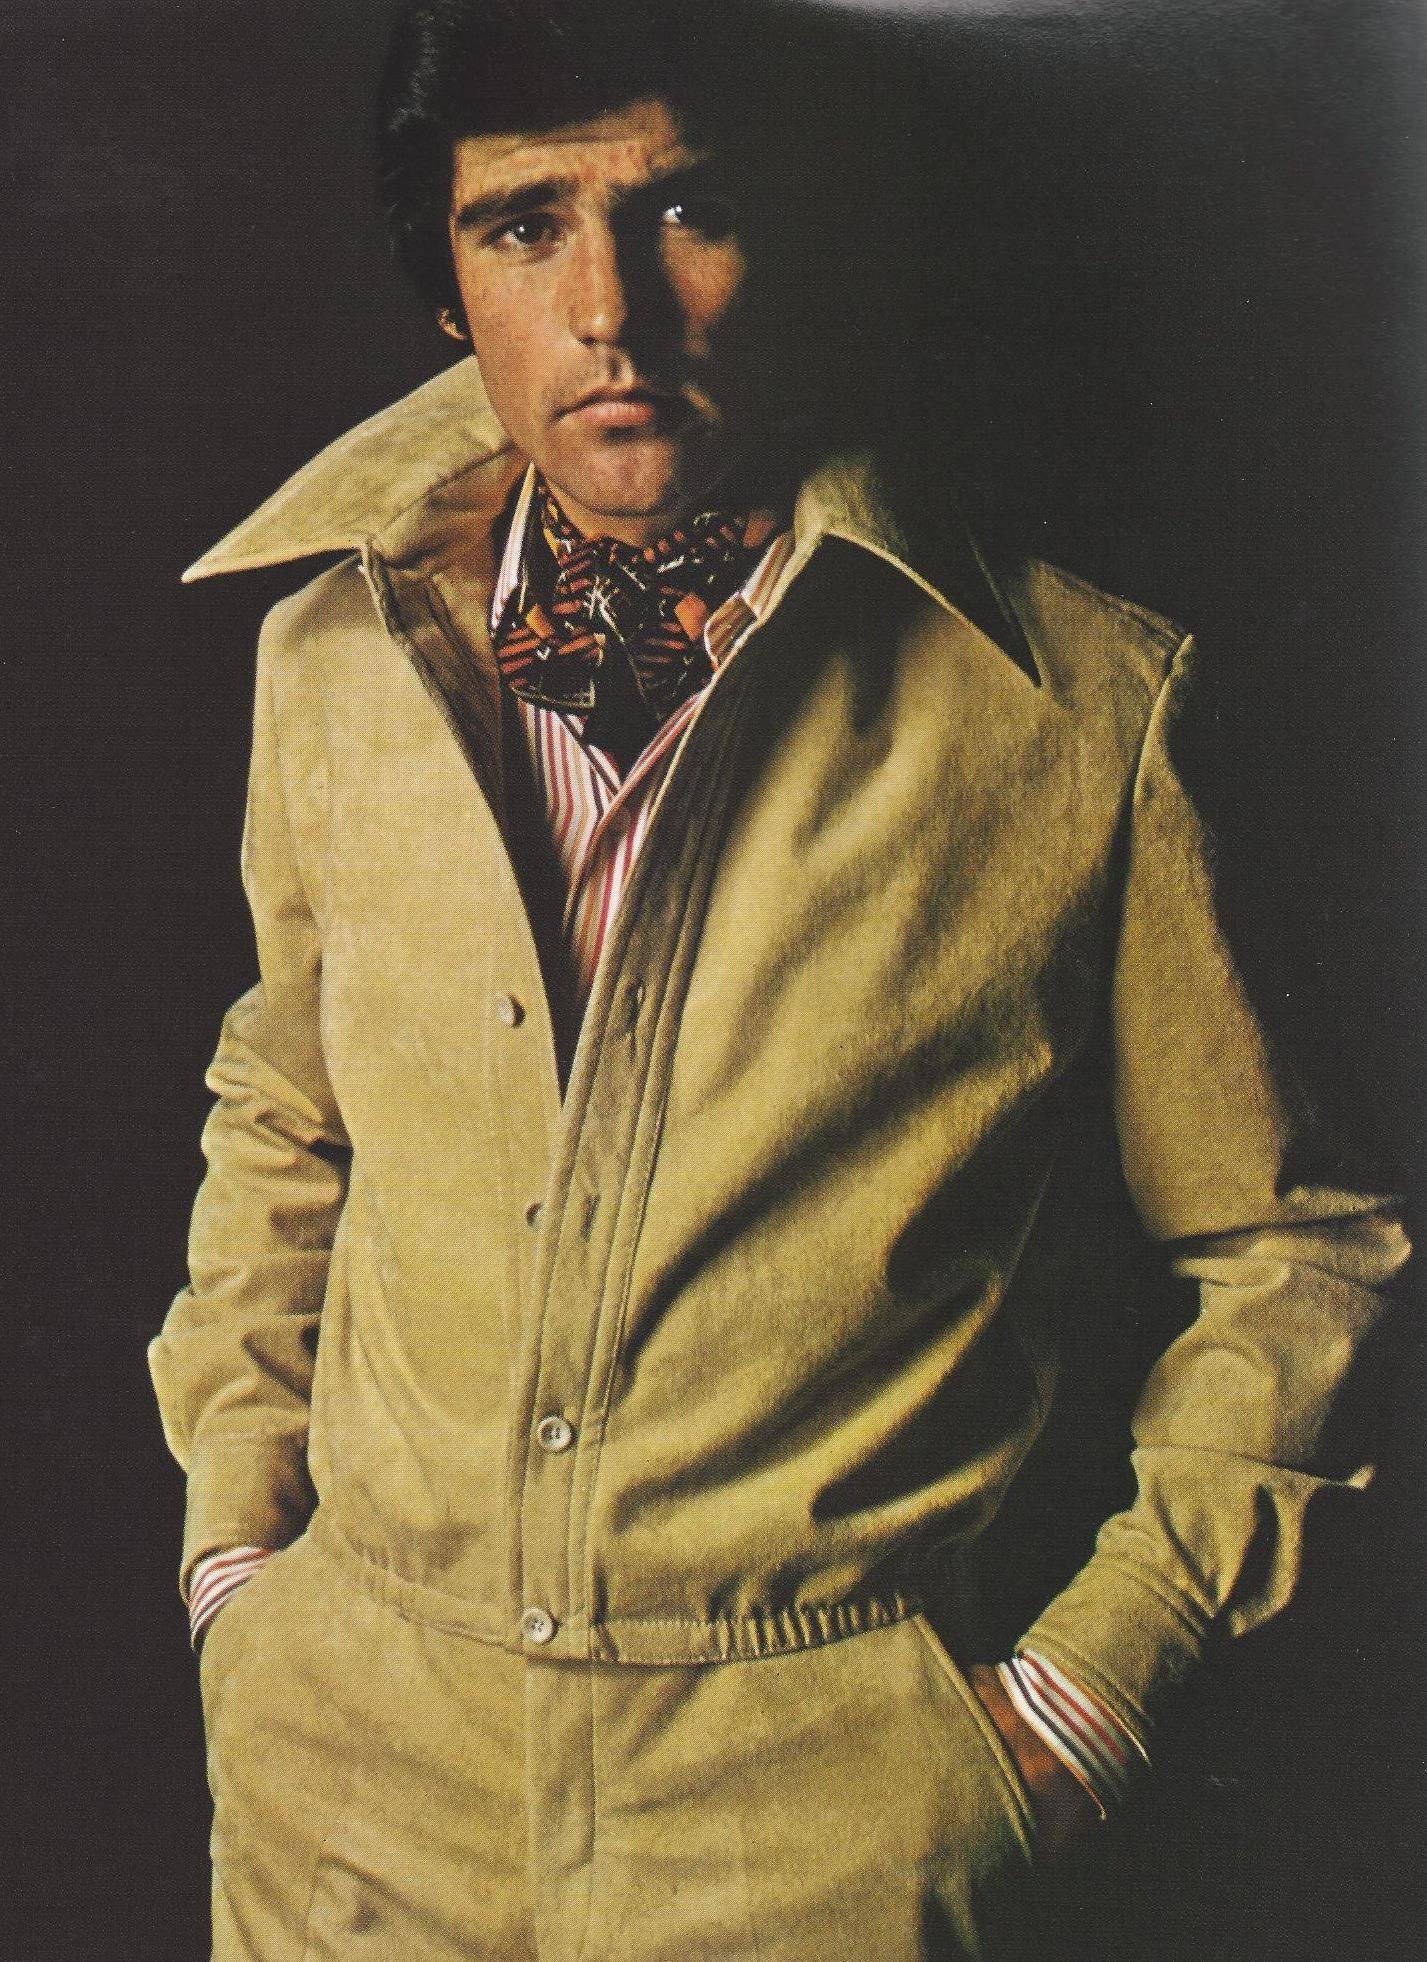 1970 Mens Clothes Google Search: Men's Fashion 1970's - Google Search